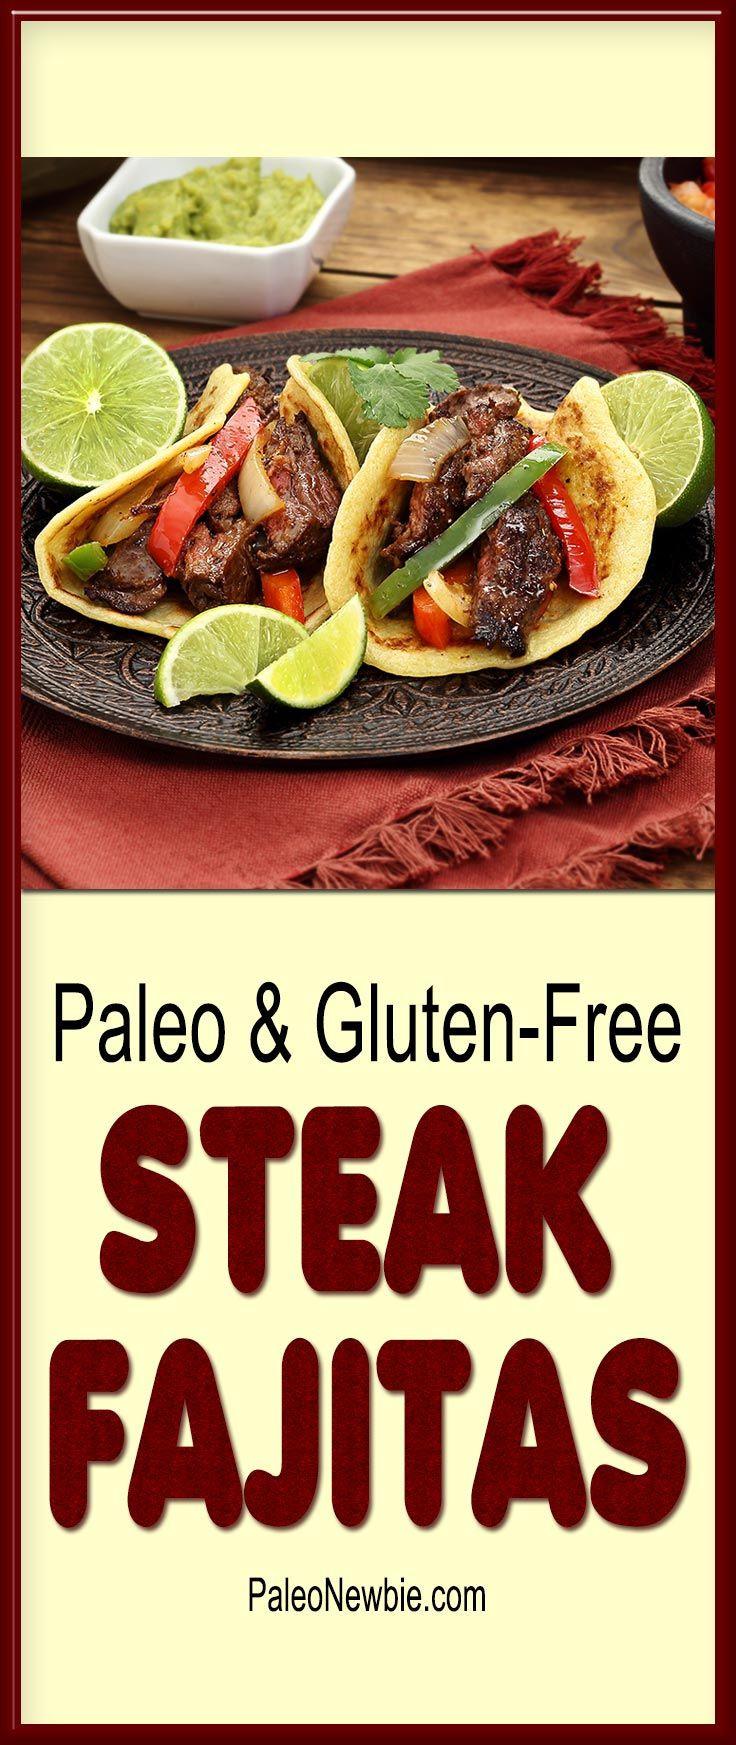 Healthy Steak Fajitas  Steak Fajitas with Paleo Tortillas Recipe